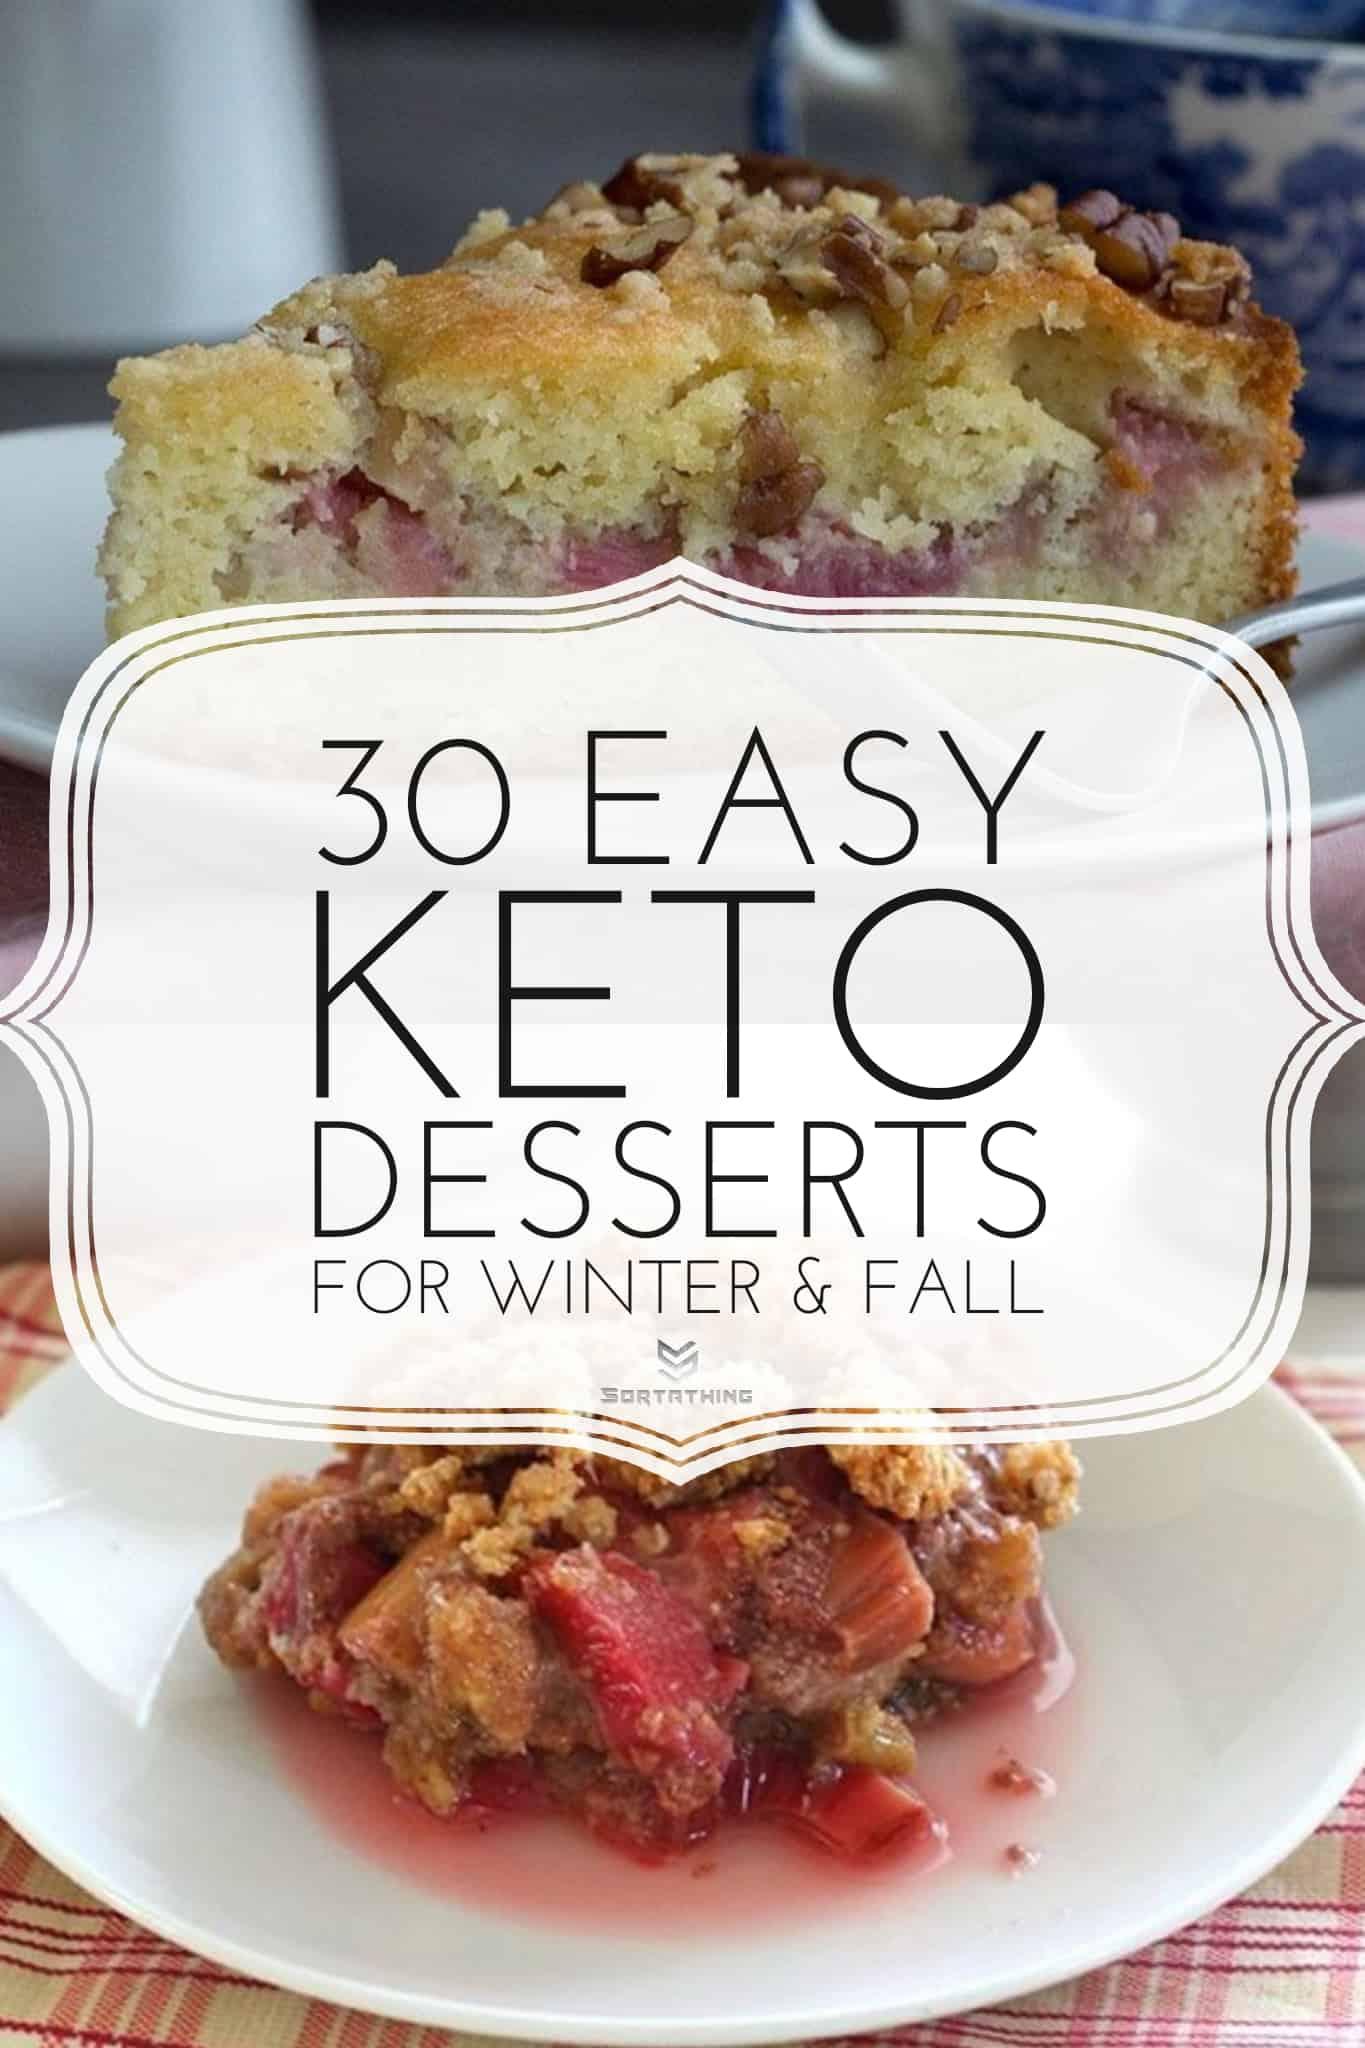 Keto Rhubarb Coffee Cake and Low Carb & Gluten-Free Rhubarb Crumble